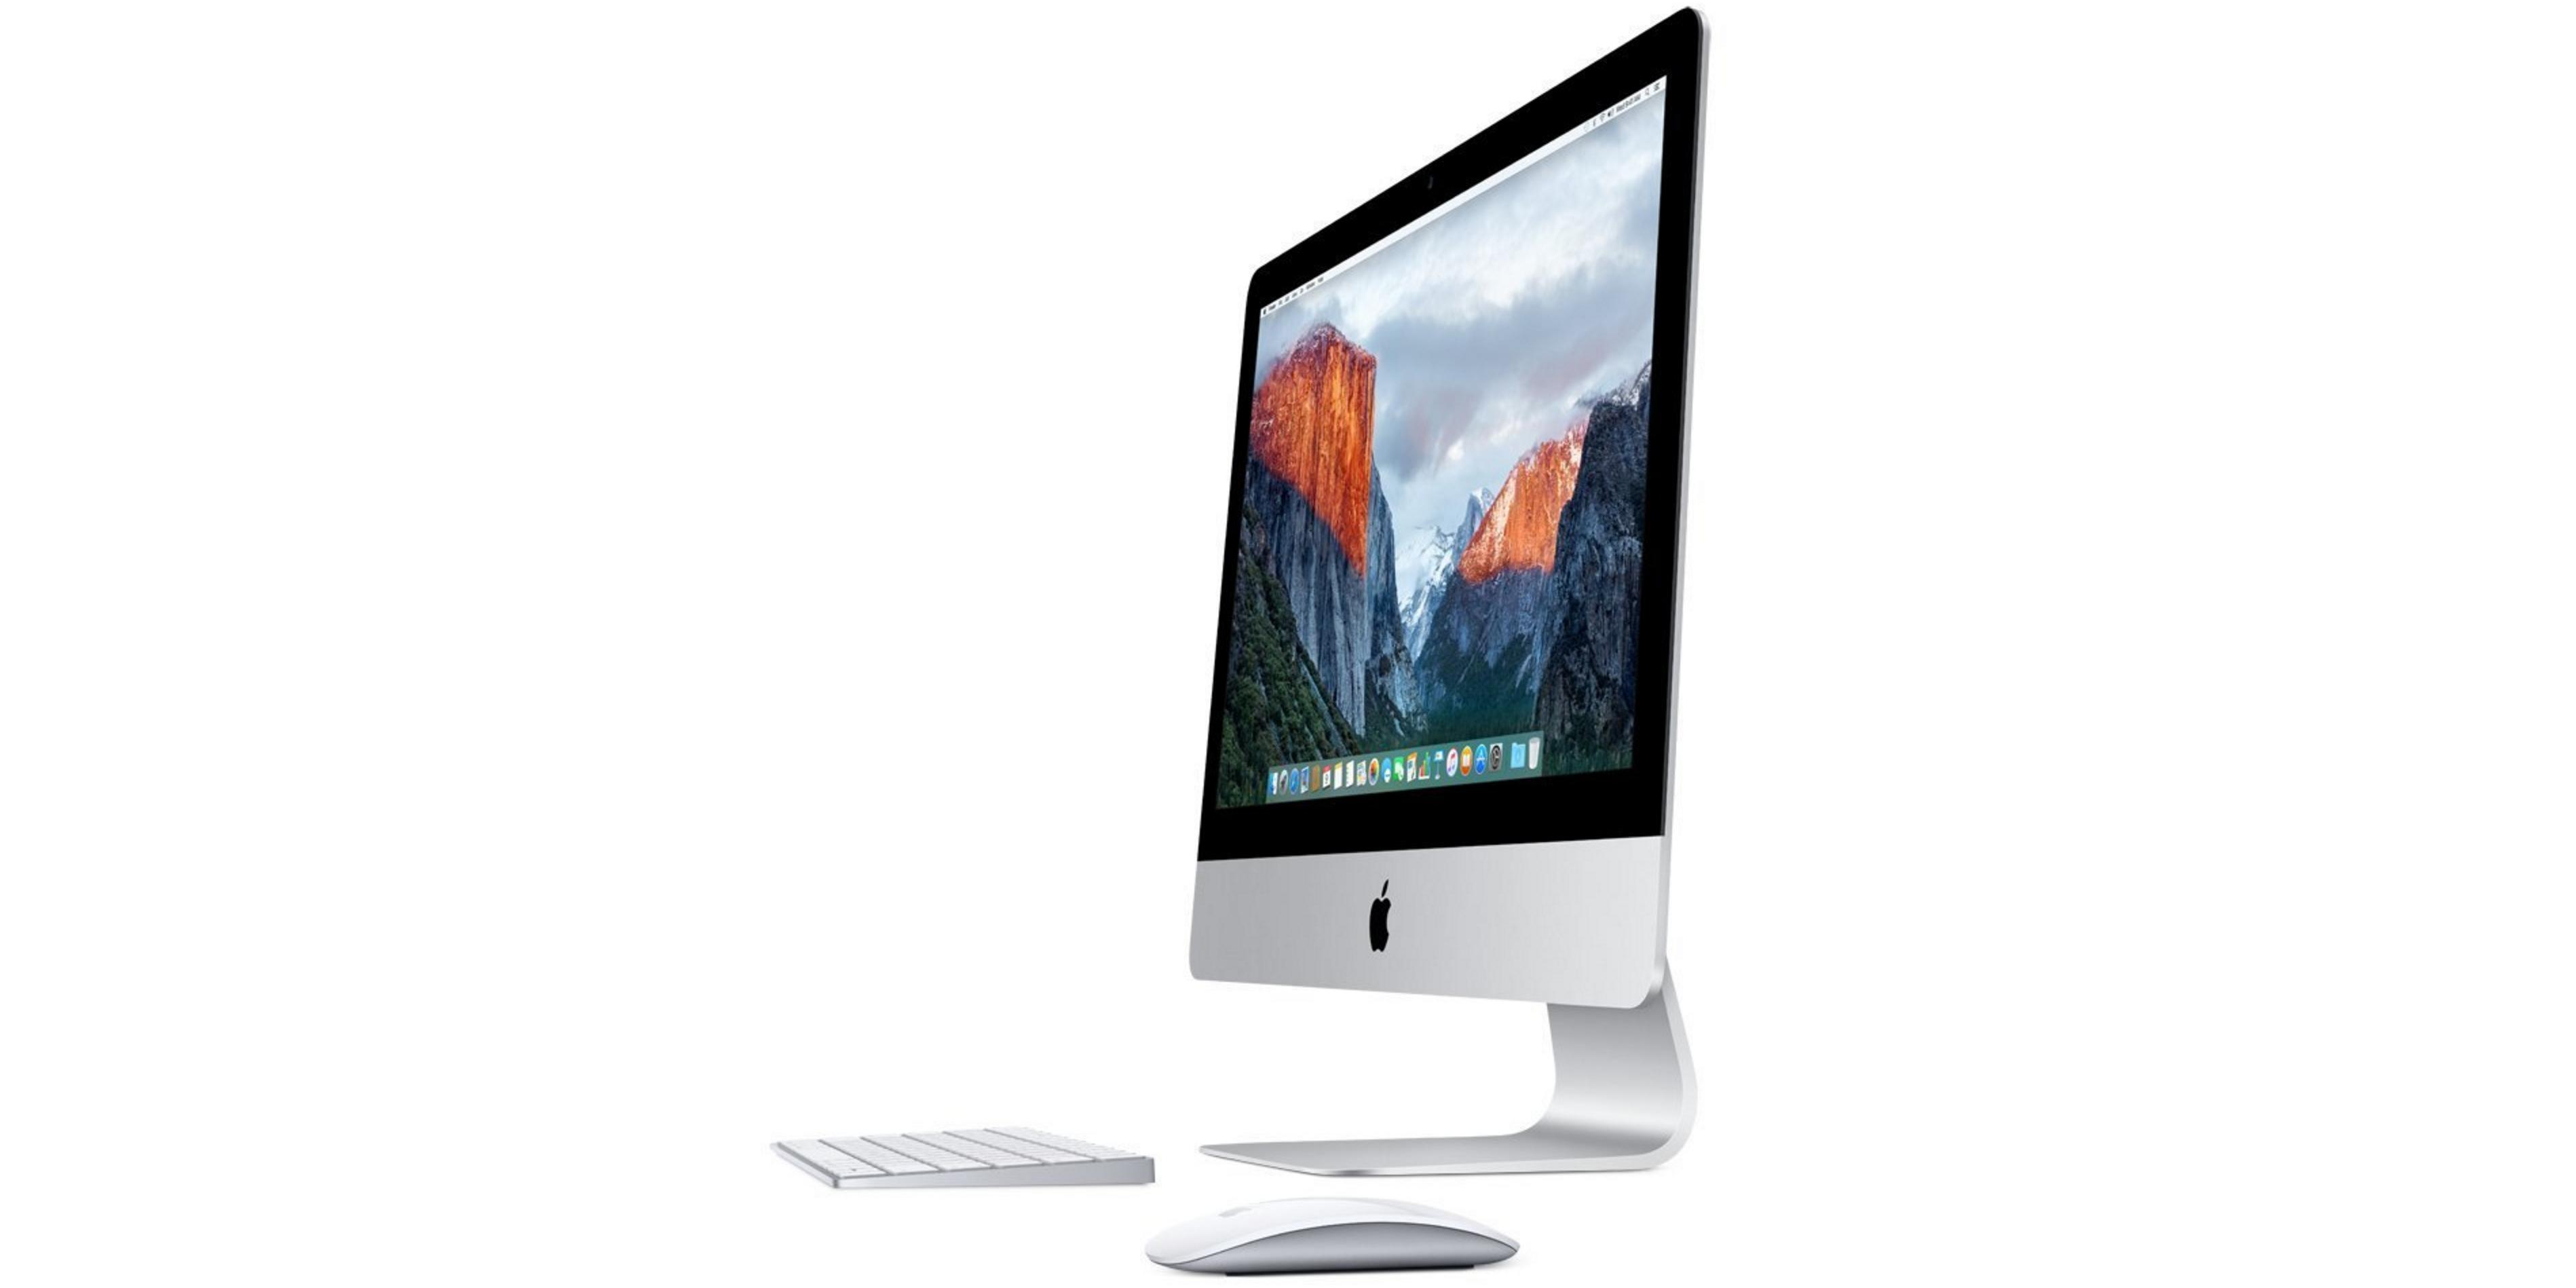 apple-imac-mk142ll-a